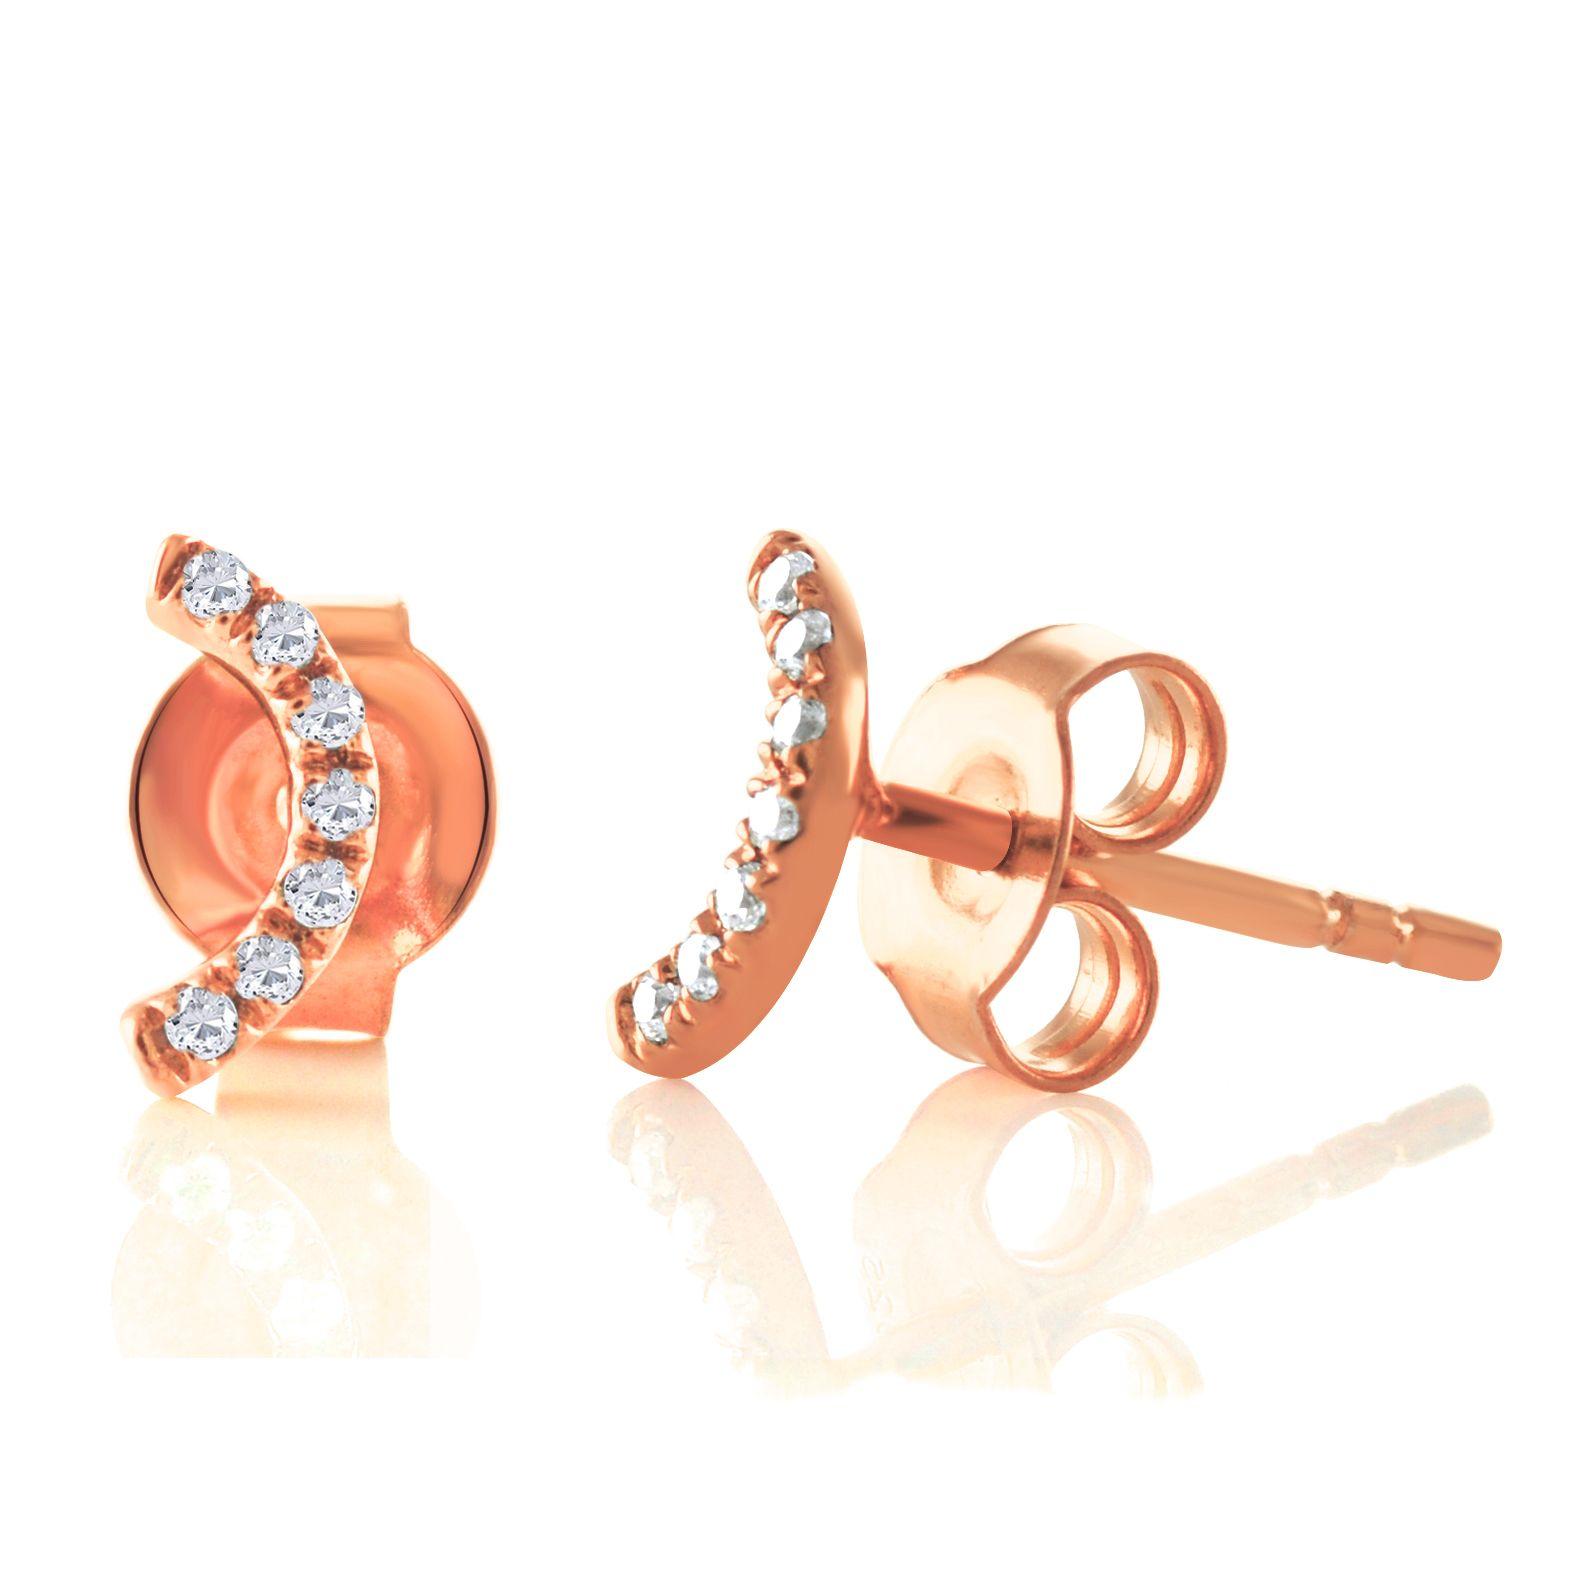 Solid Rose Gold Half Moon Studs 14K Gold Diamond Stud Earrings